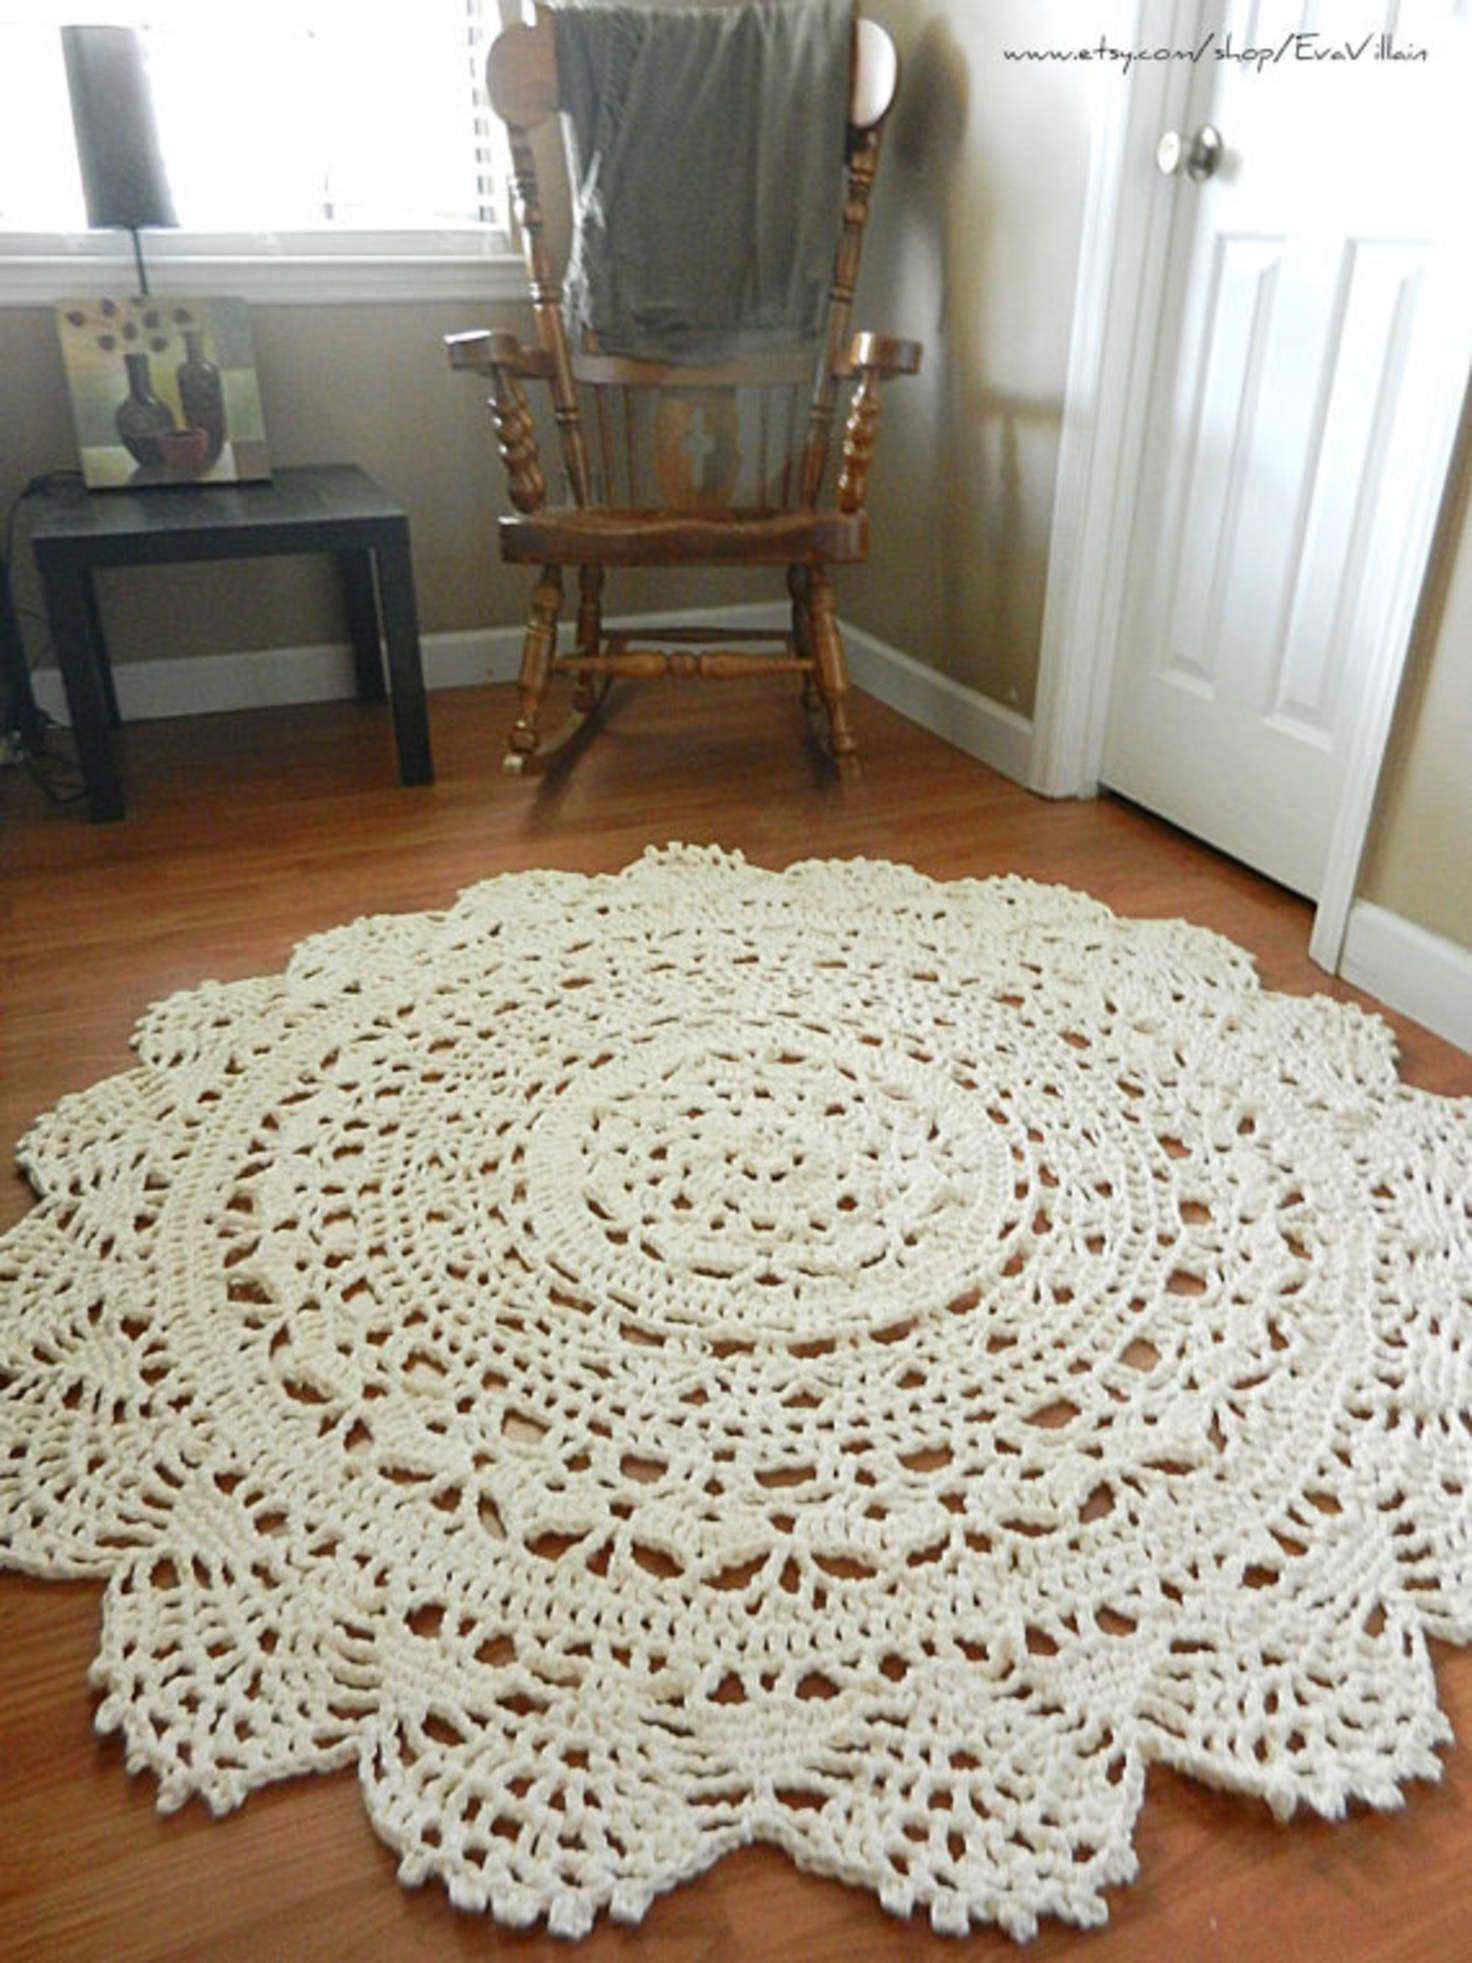 Giant Crochet Doily Rug Floor Off White Ecru Lace Large Area Cottage Chic Oversized Shabby Home Decor Round